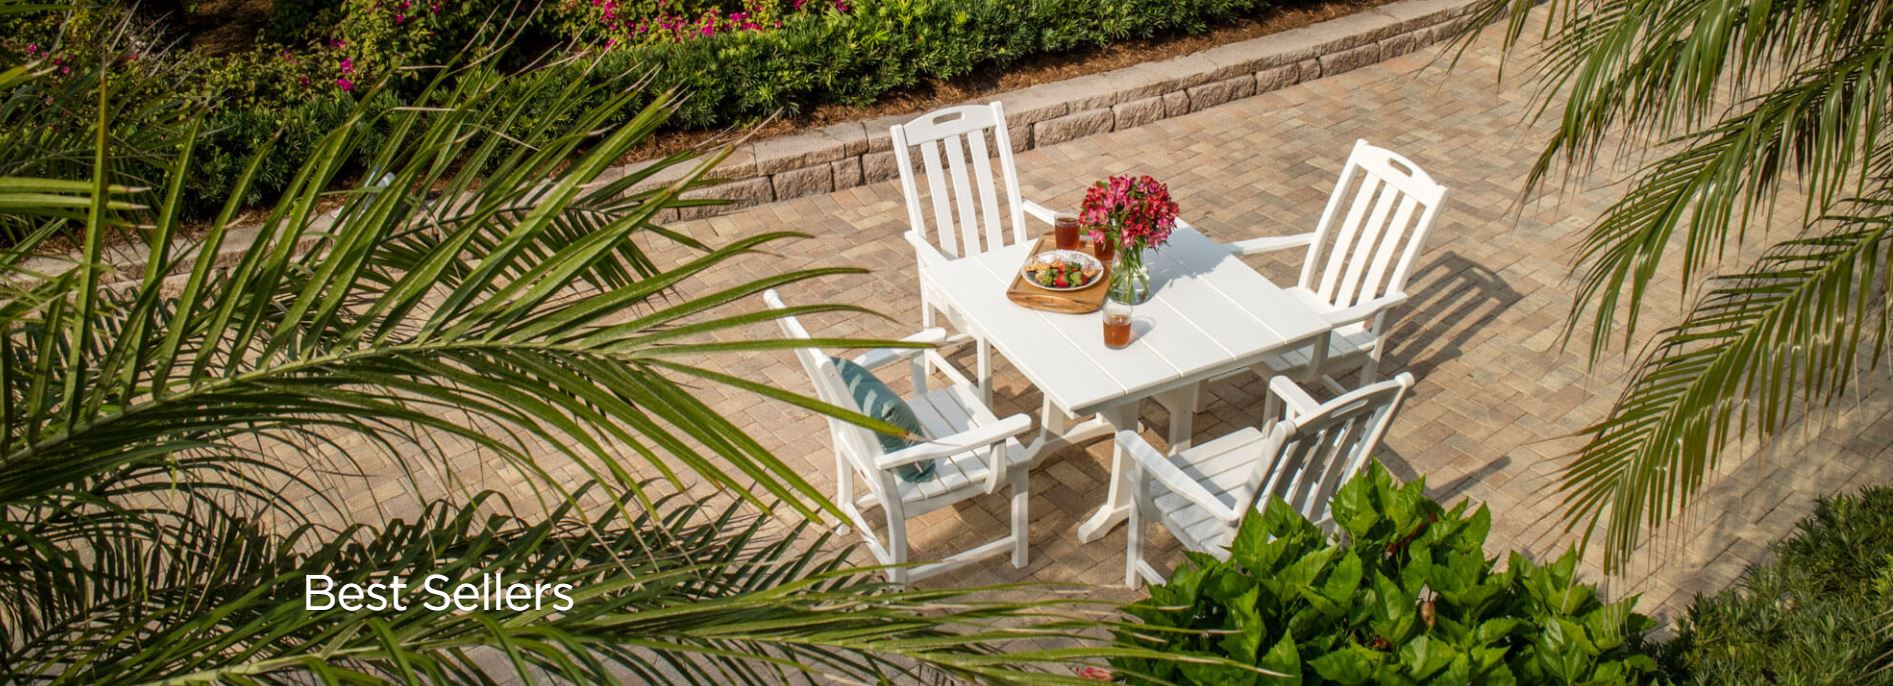 Trex Outdoor Furniture Best Sellers